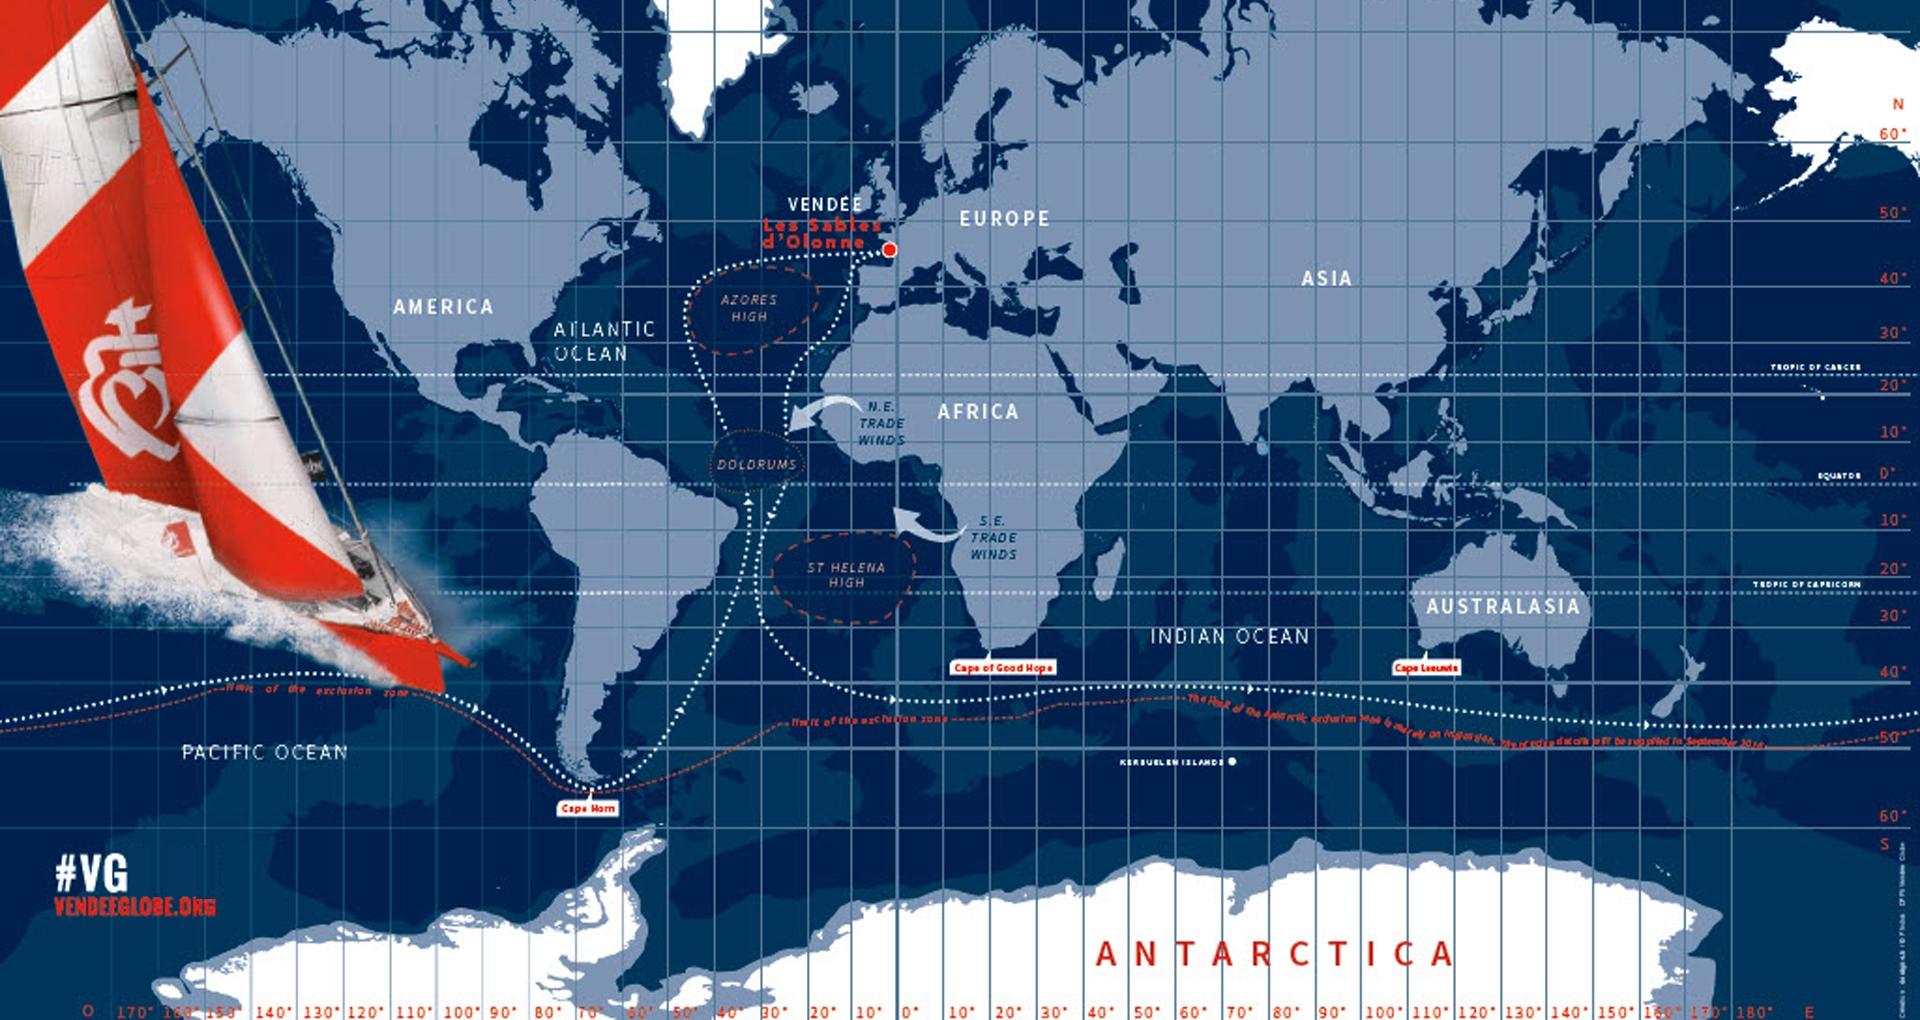 Vendee Globe Race Route_Web